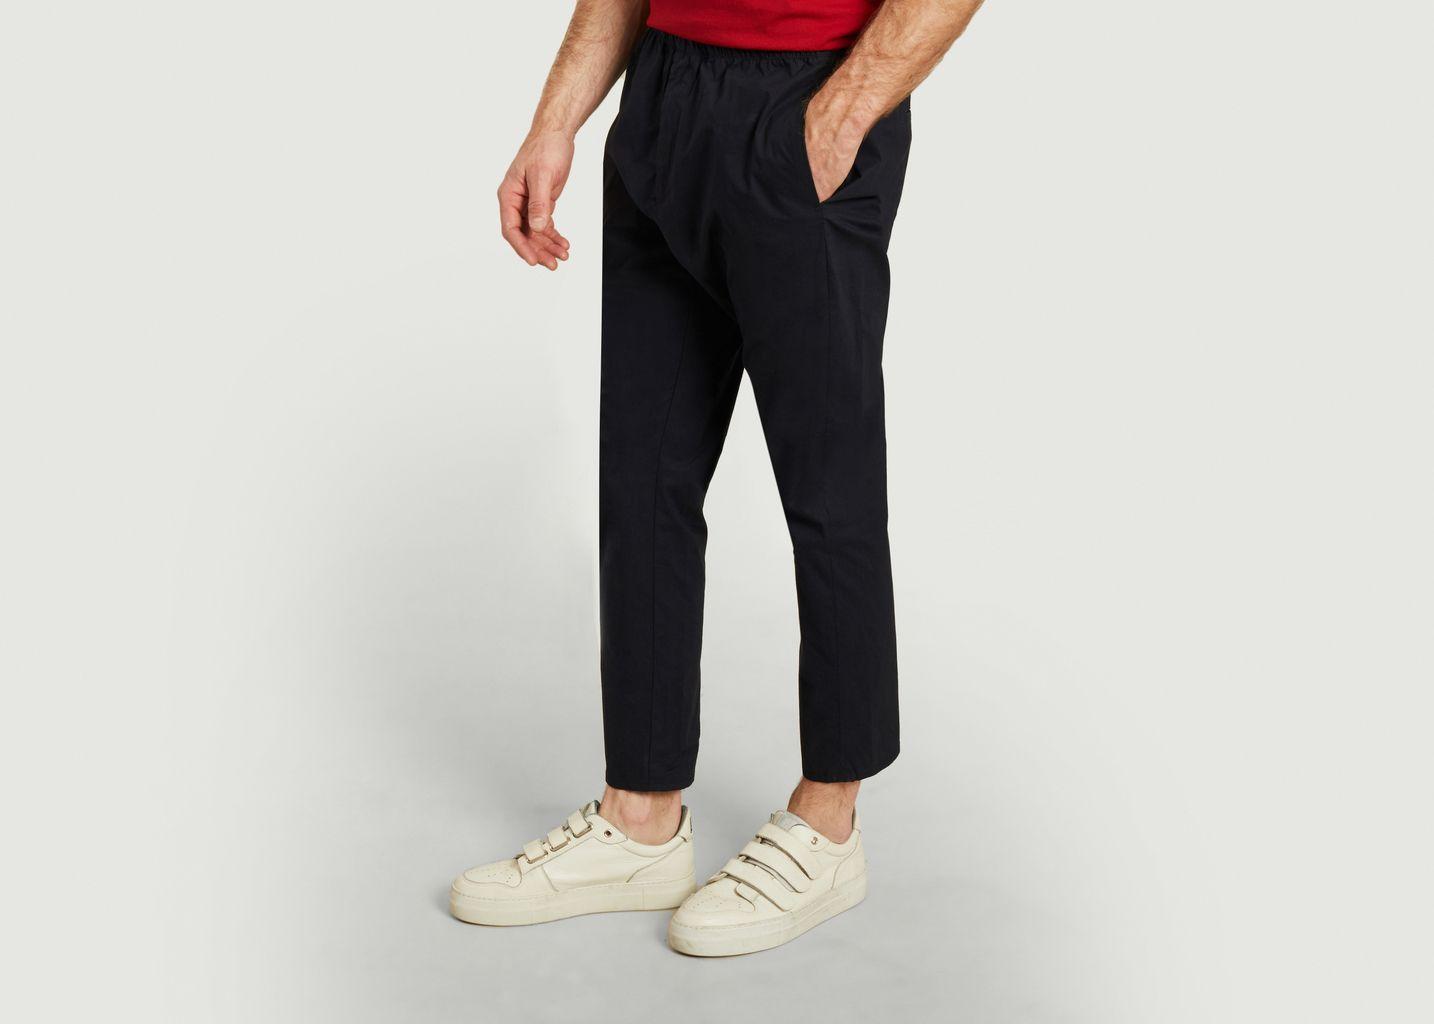 Pantalon Leni - Loreak Mendian